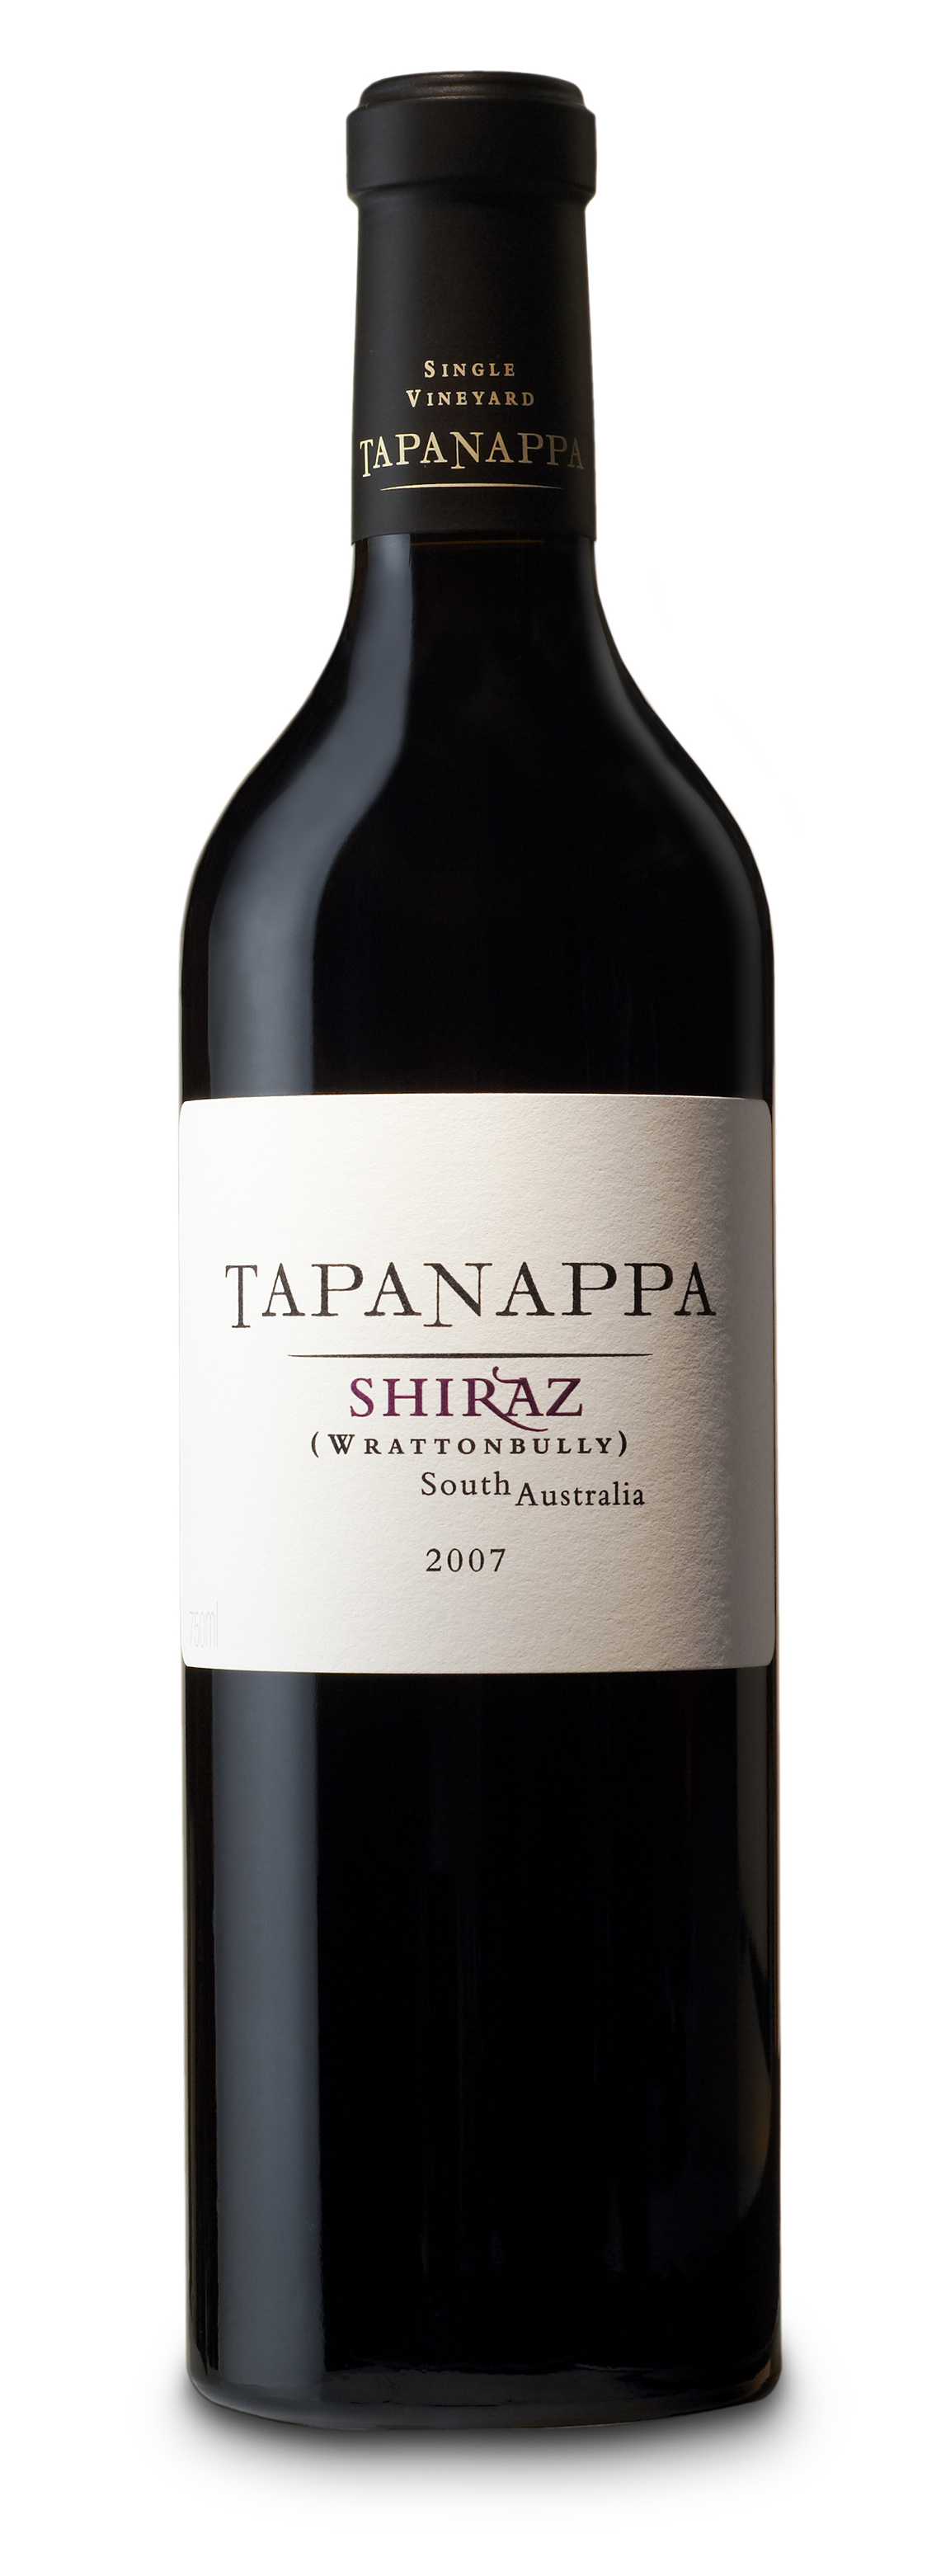 Tapanappa 2007 Wrattonbully Shiraz bottleshot